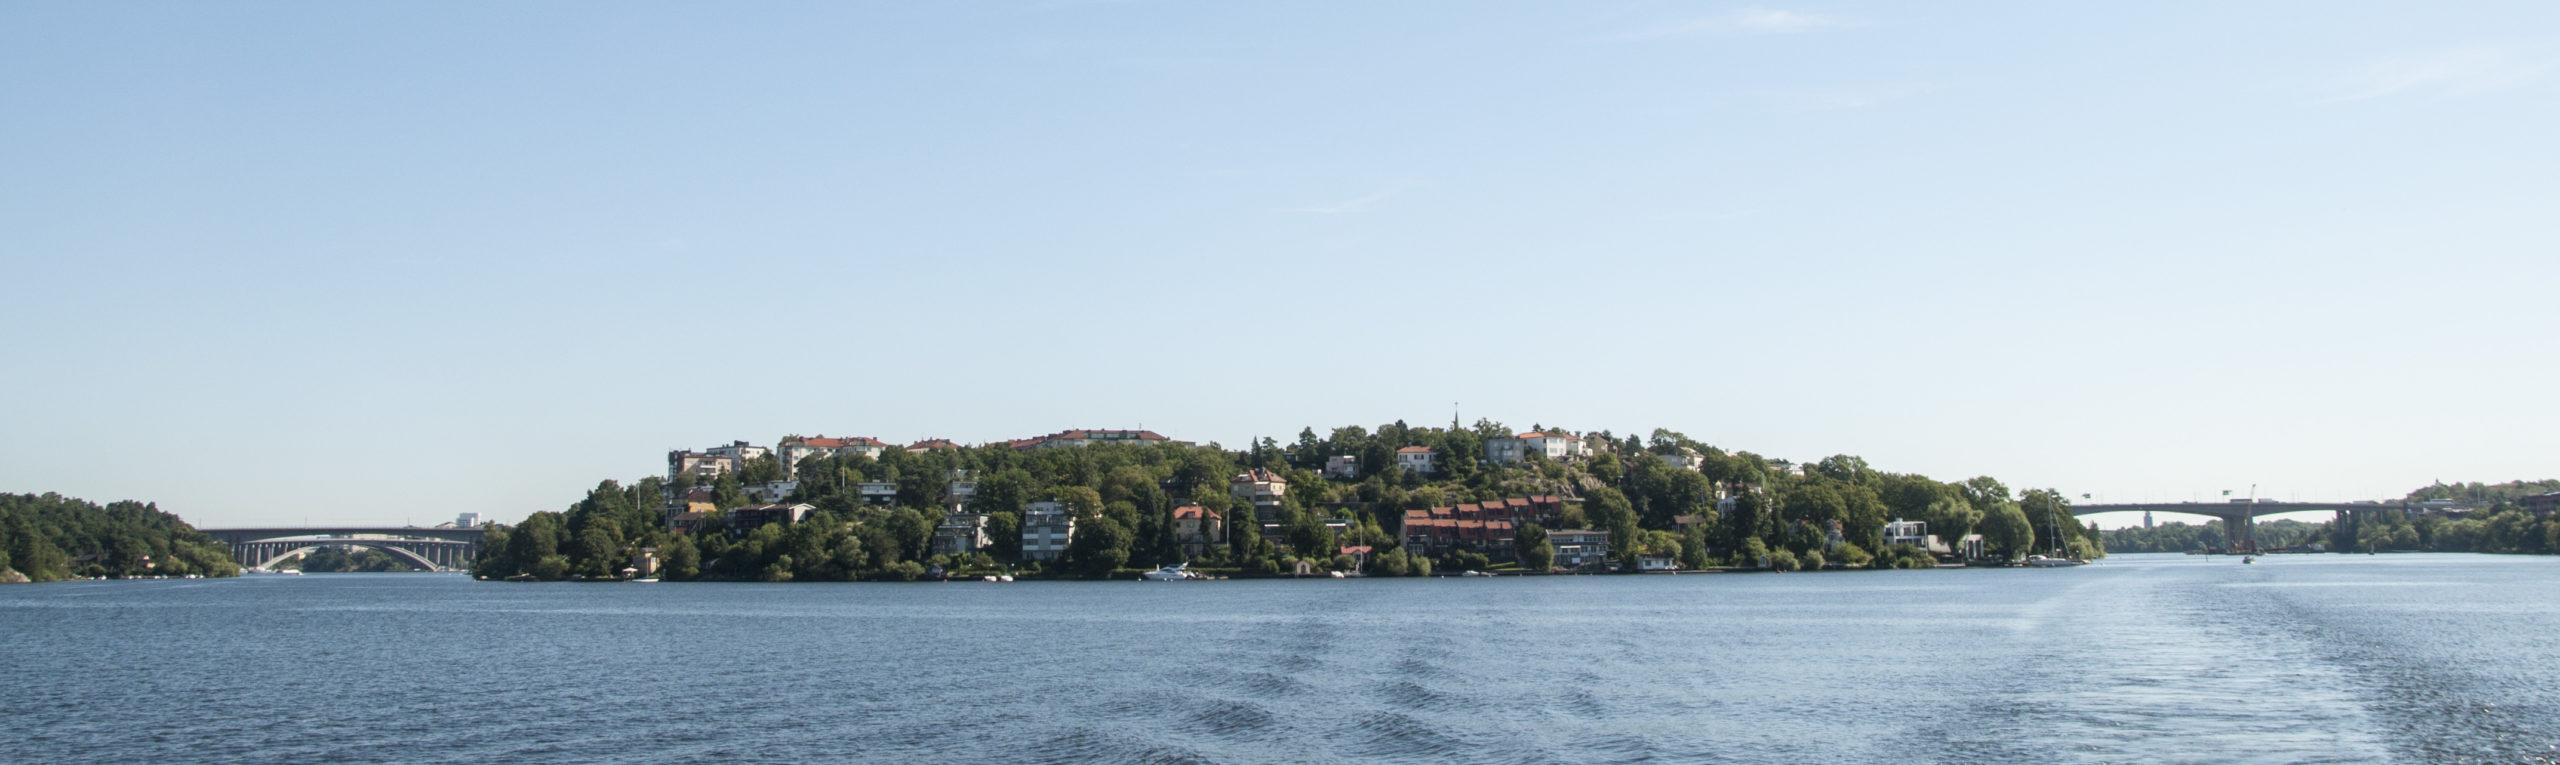 Stora Essingen, Stockholm